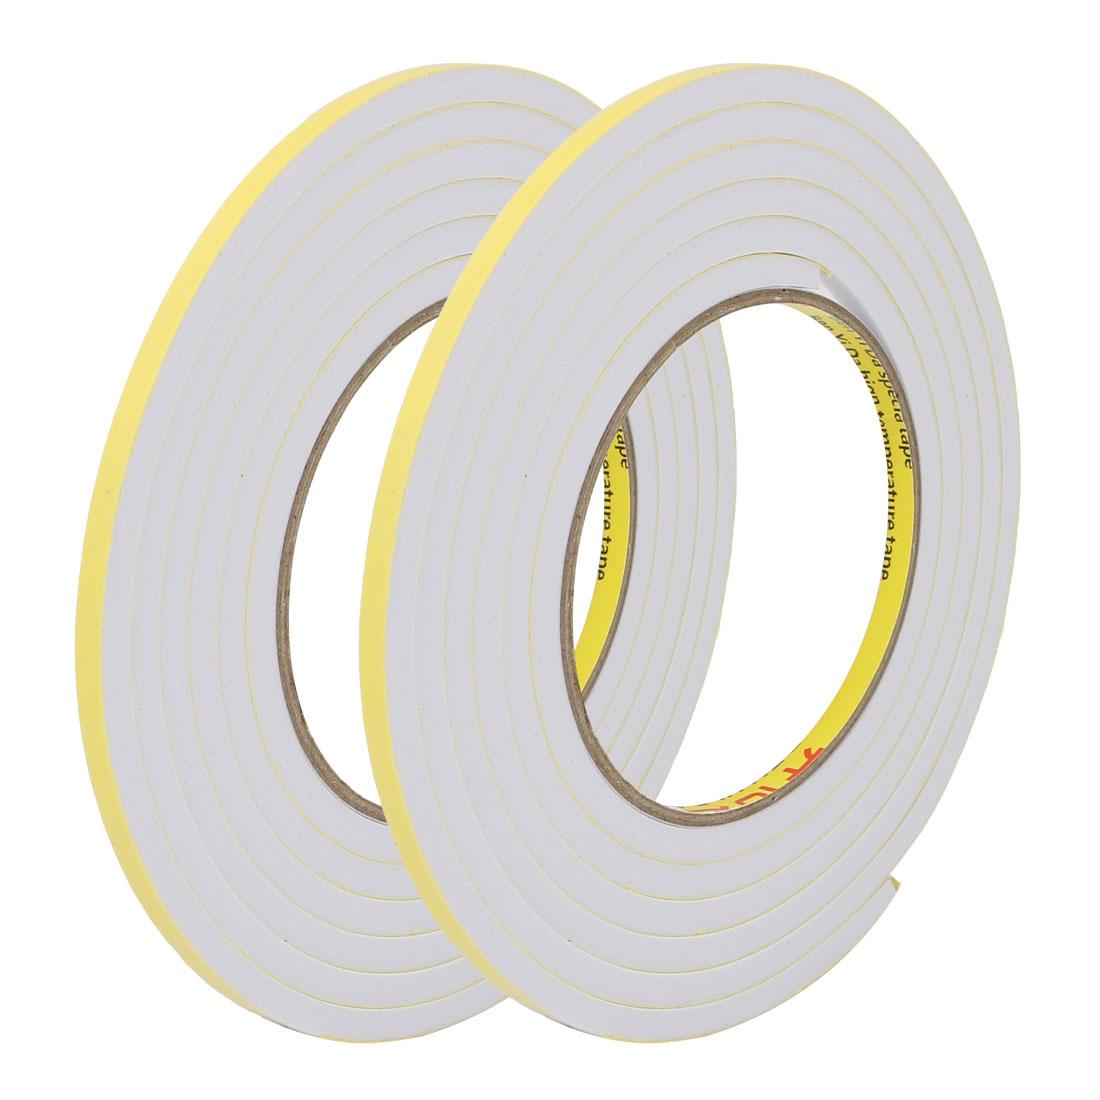 2pcs 5mm Wide 5mm Thick Single Sided Shockproof EVA Sponge Tape White 2M Long